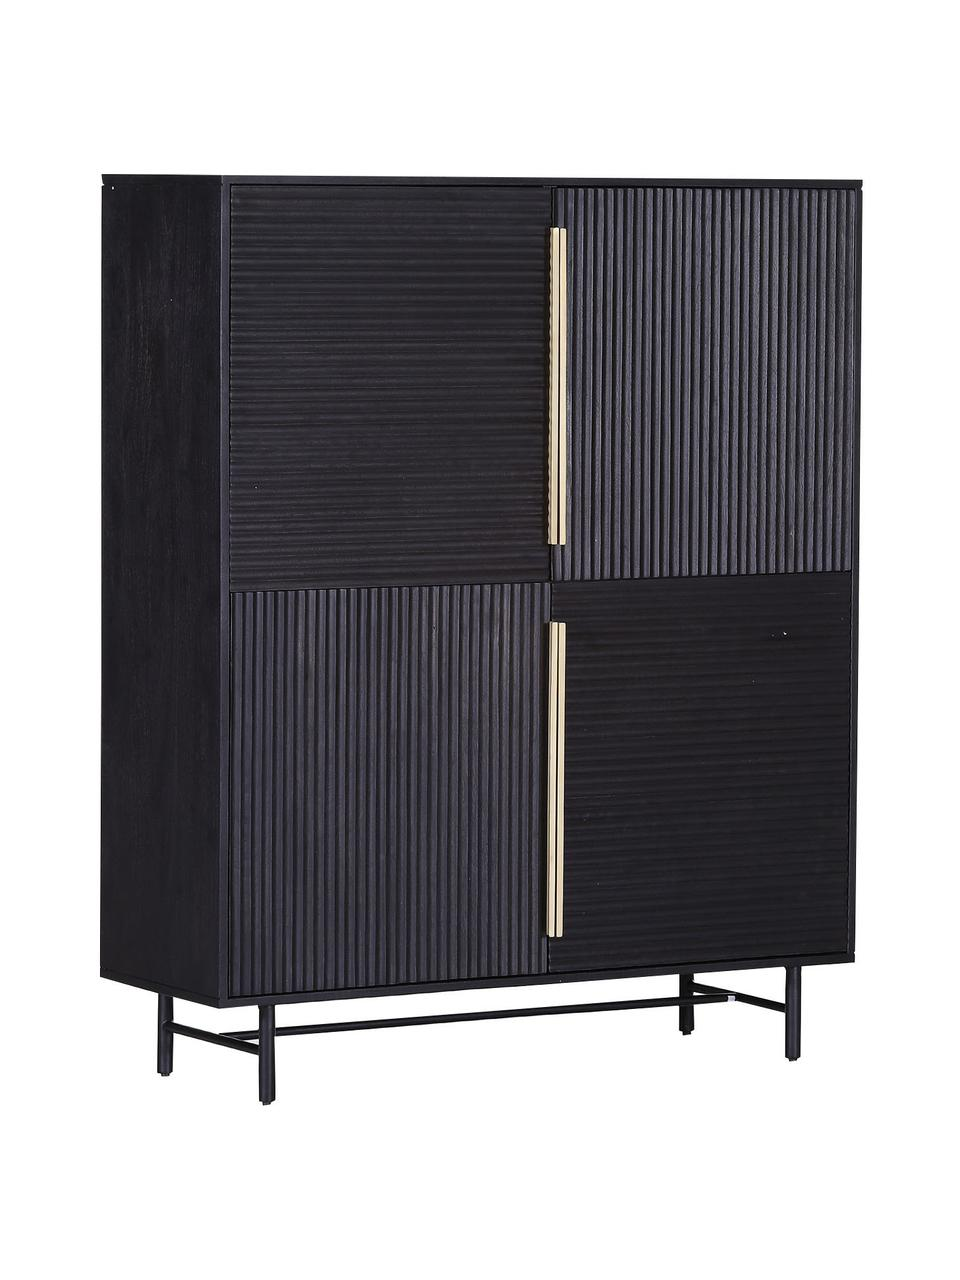 Akazienholz-Highboard Mamba mit geriffelter Front, Korpus: Akazienholz, lackiert, Beine: Metall, lackiert, schwarz, 115 x 140 cm